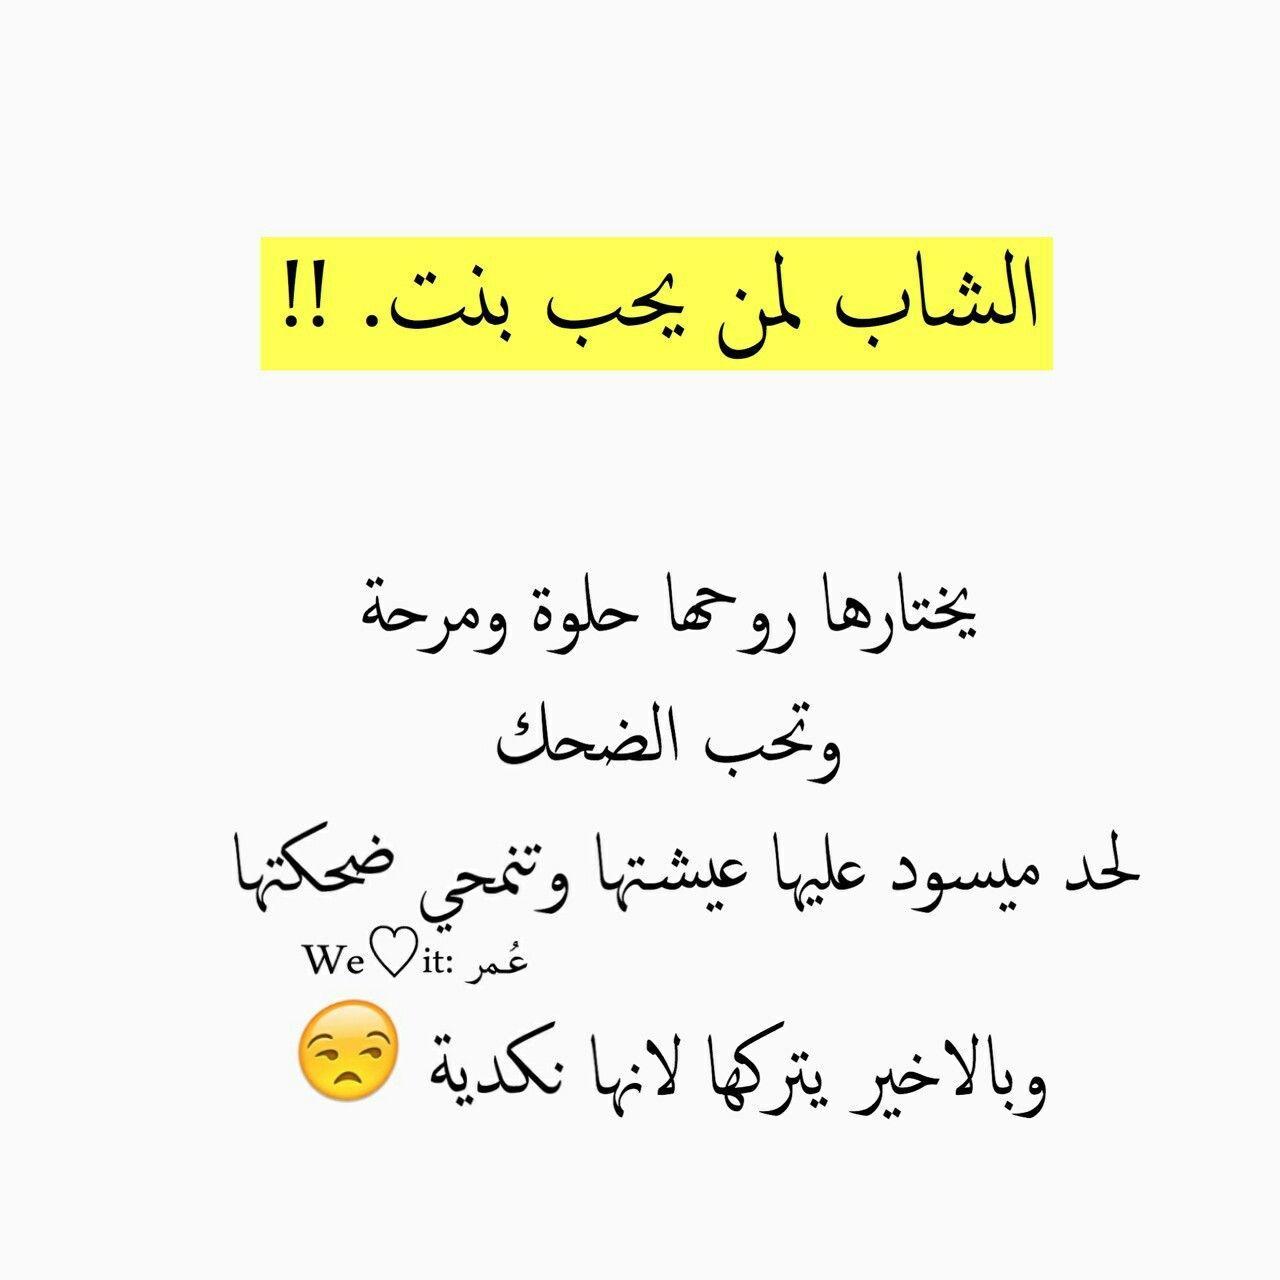 حسبي الله عليهم Math Arabic Calligraphy Calligraphy